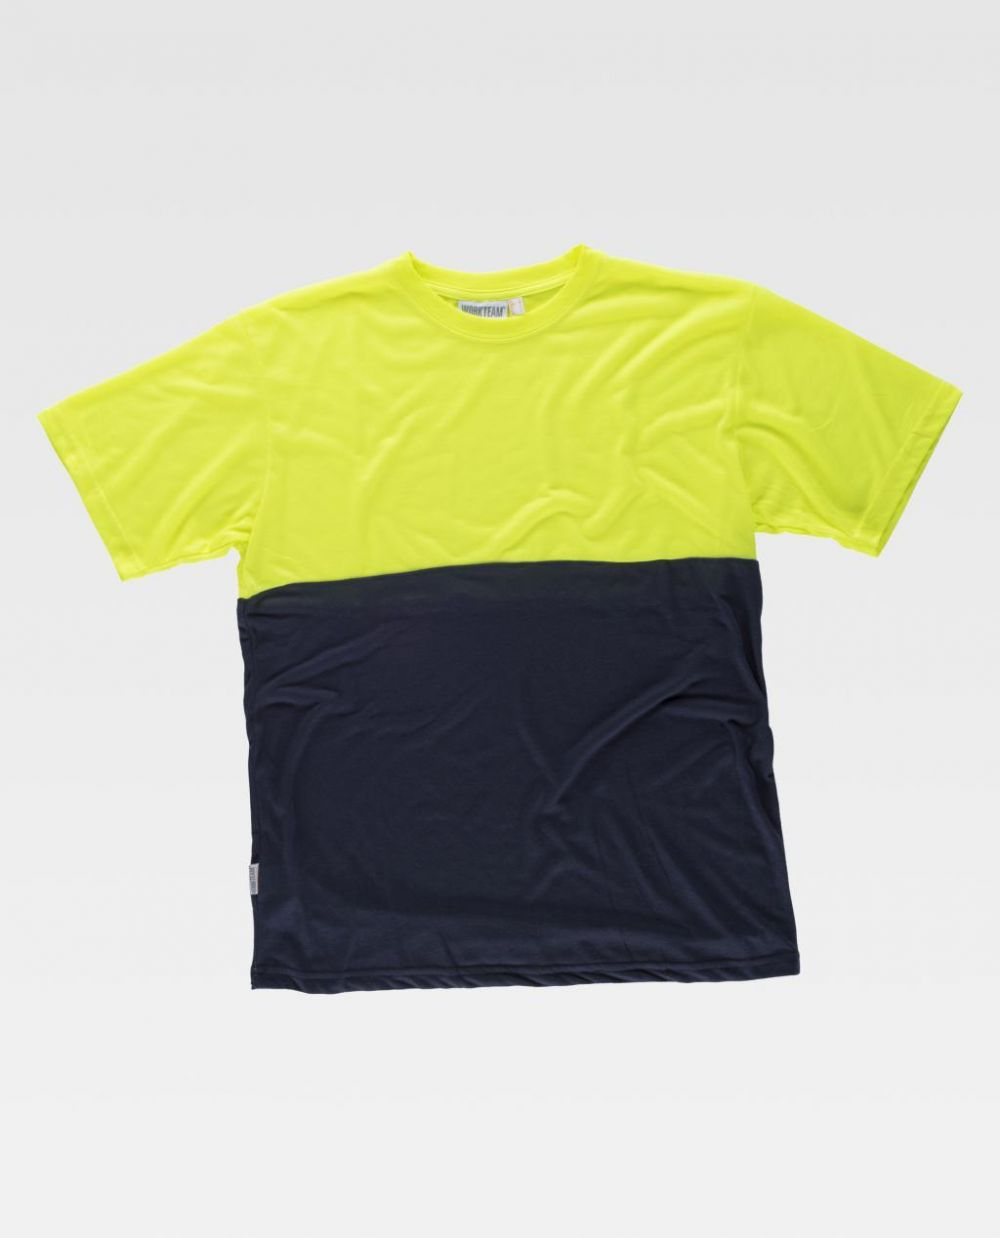 Camisetas reflectantes workteam mc combinada alta visibilidad de poliéster vista 1